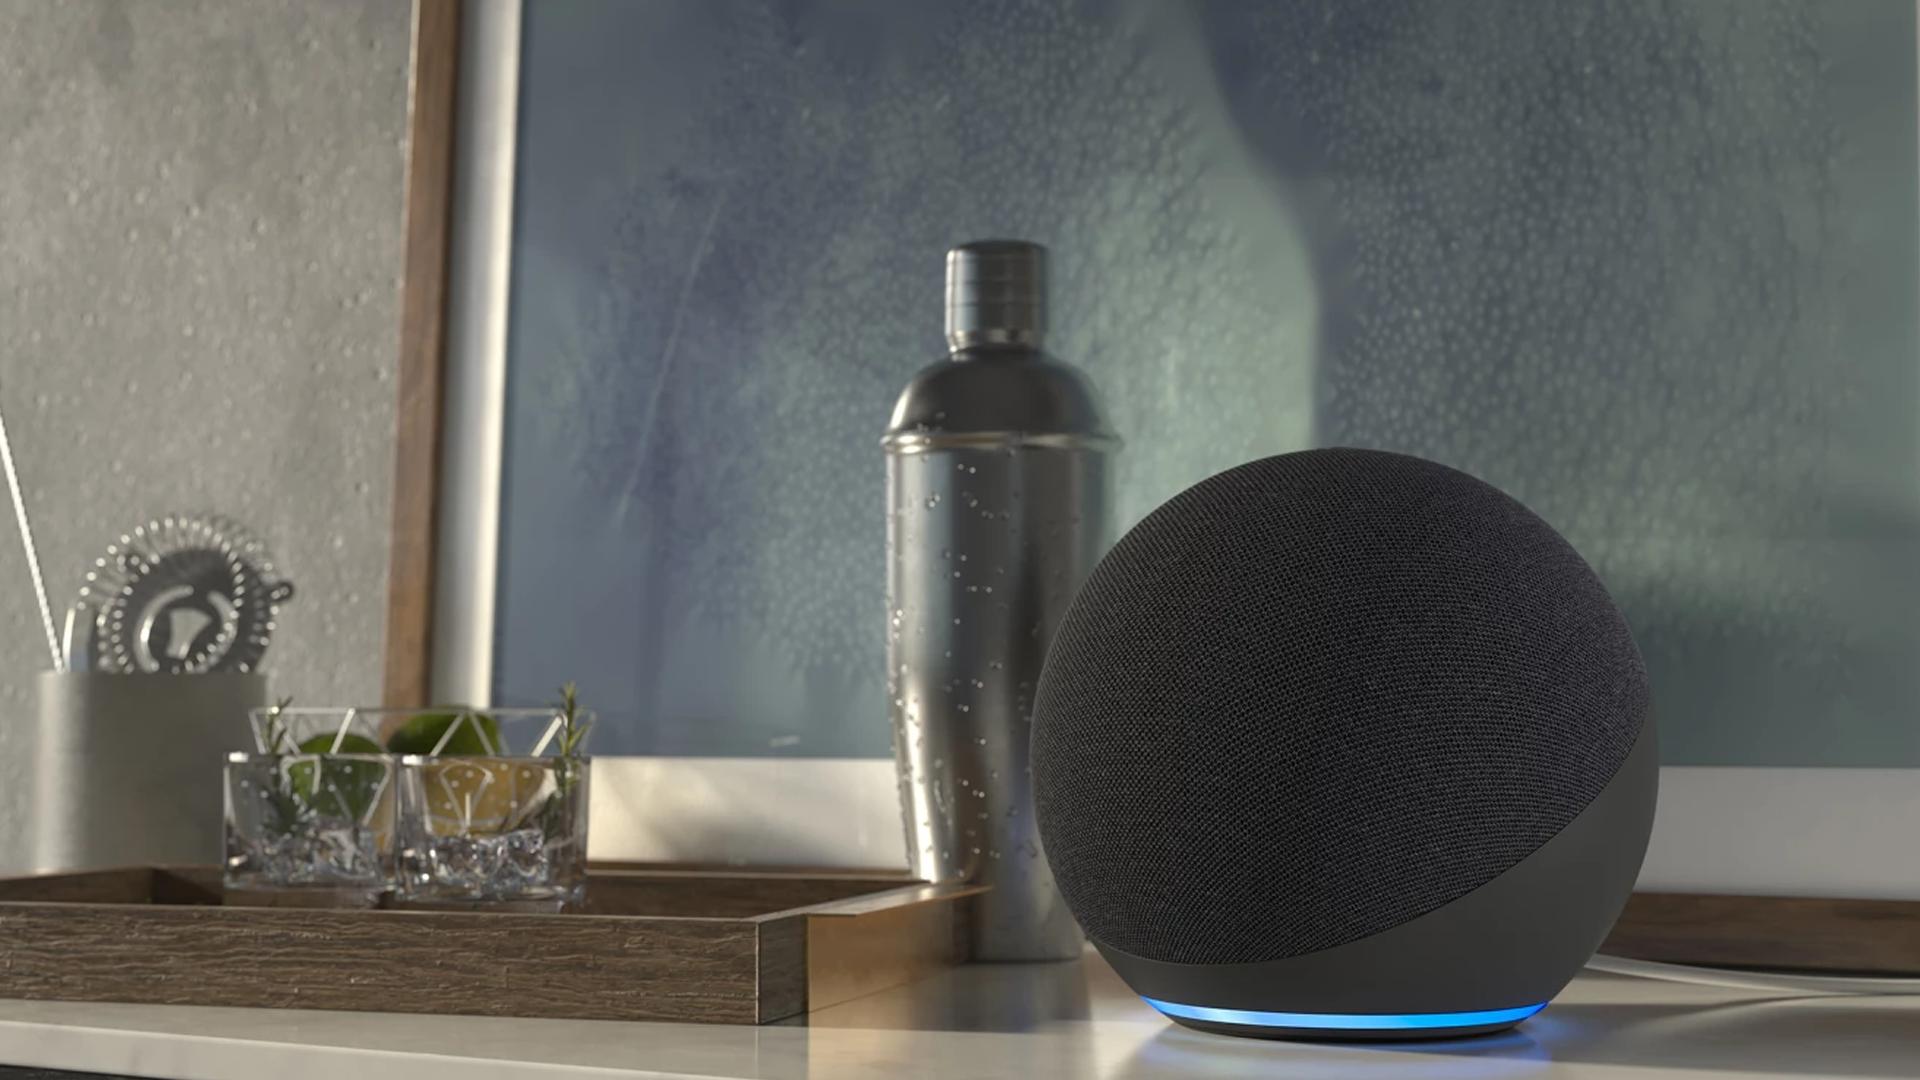 Amazon Alexa Gets New Voice Options, Including Celebrities thumbnail